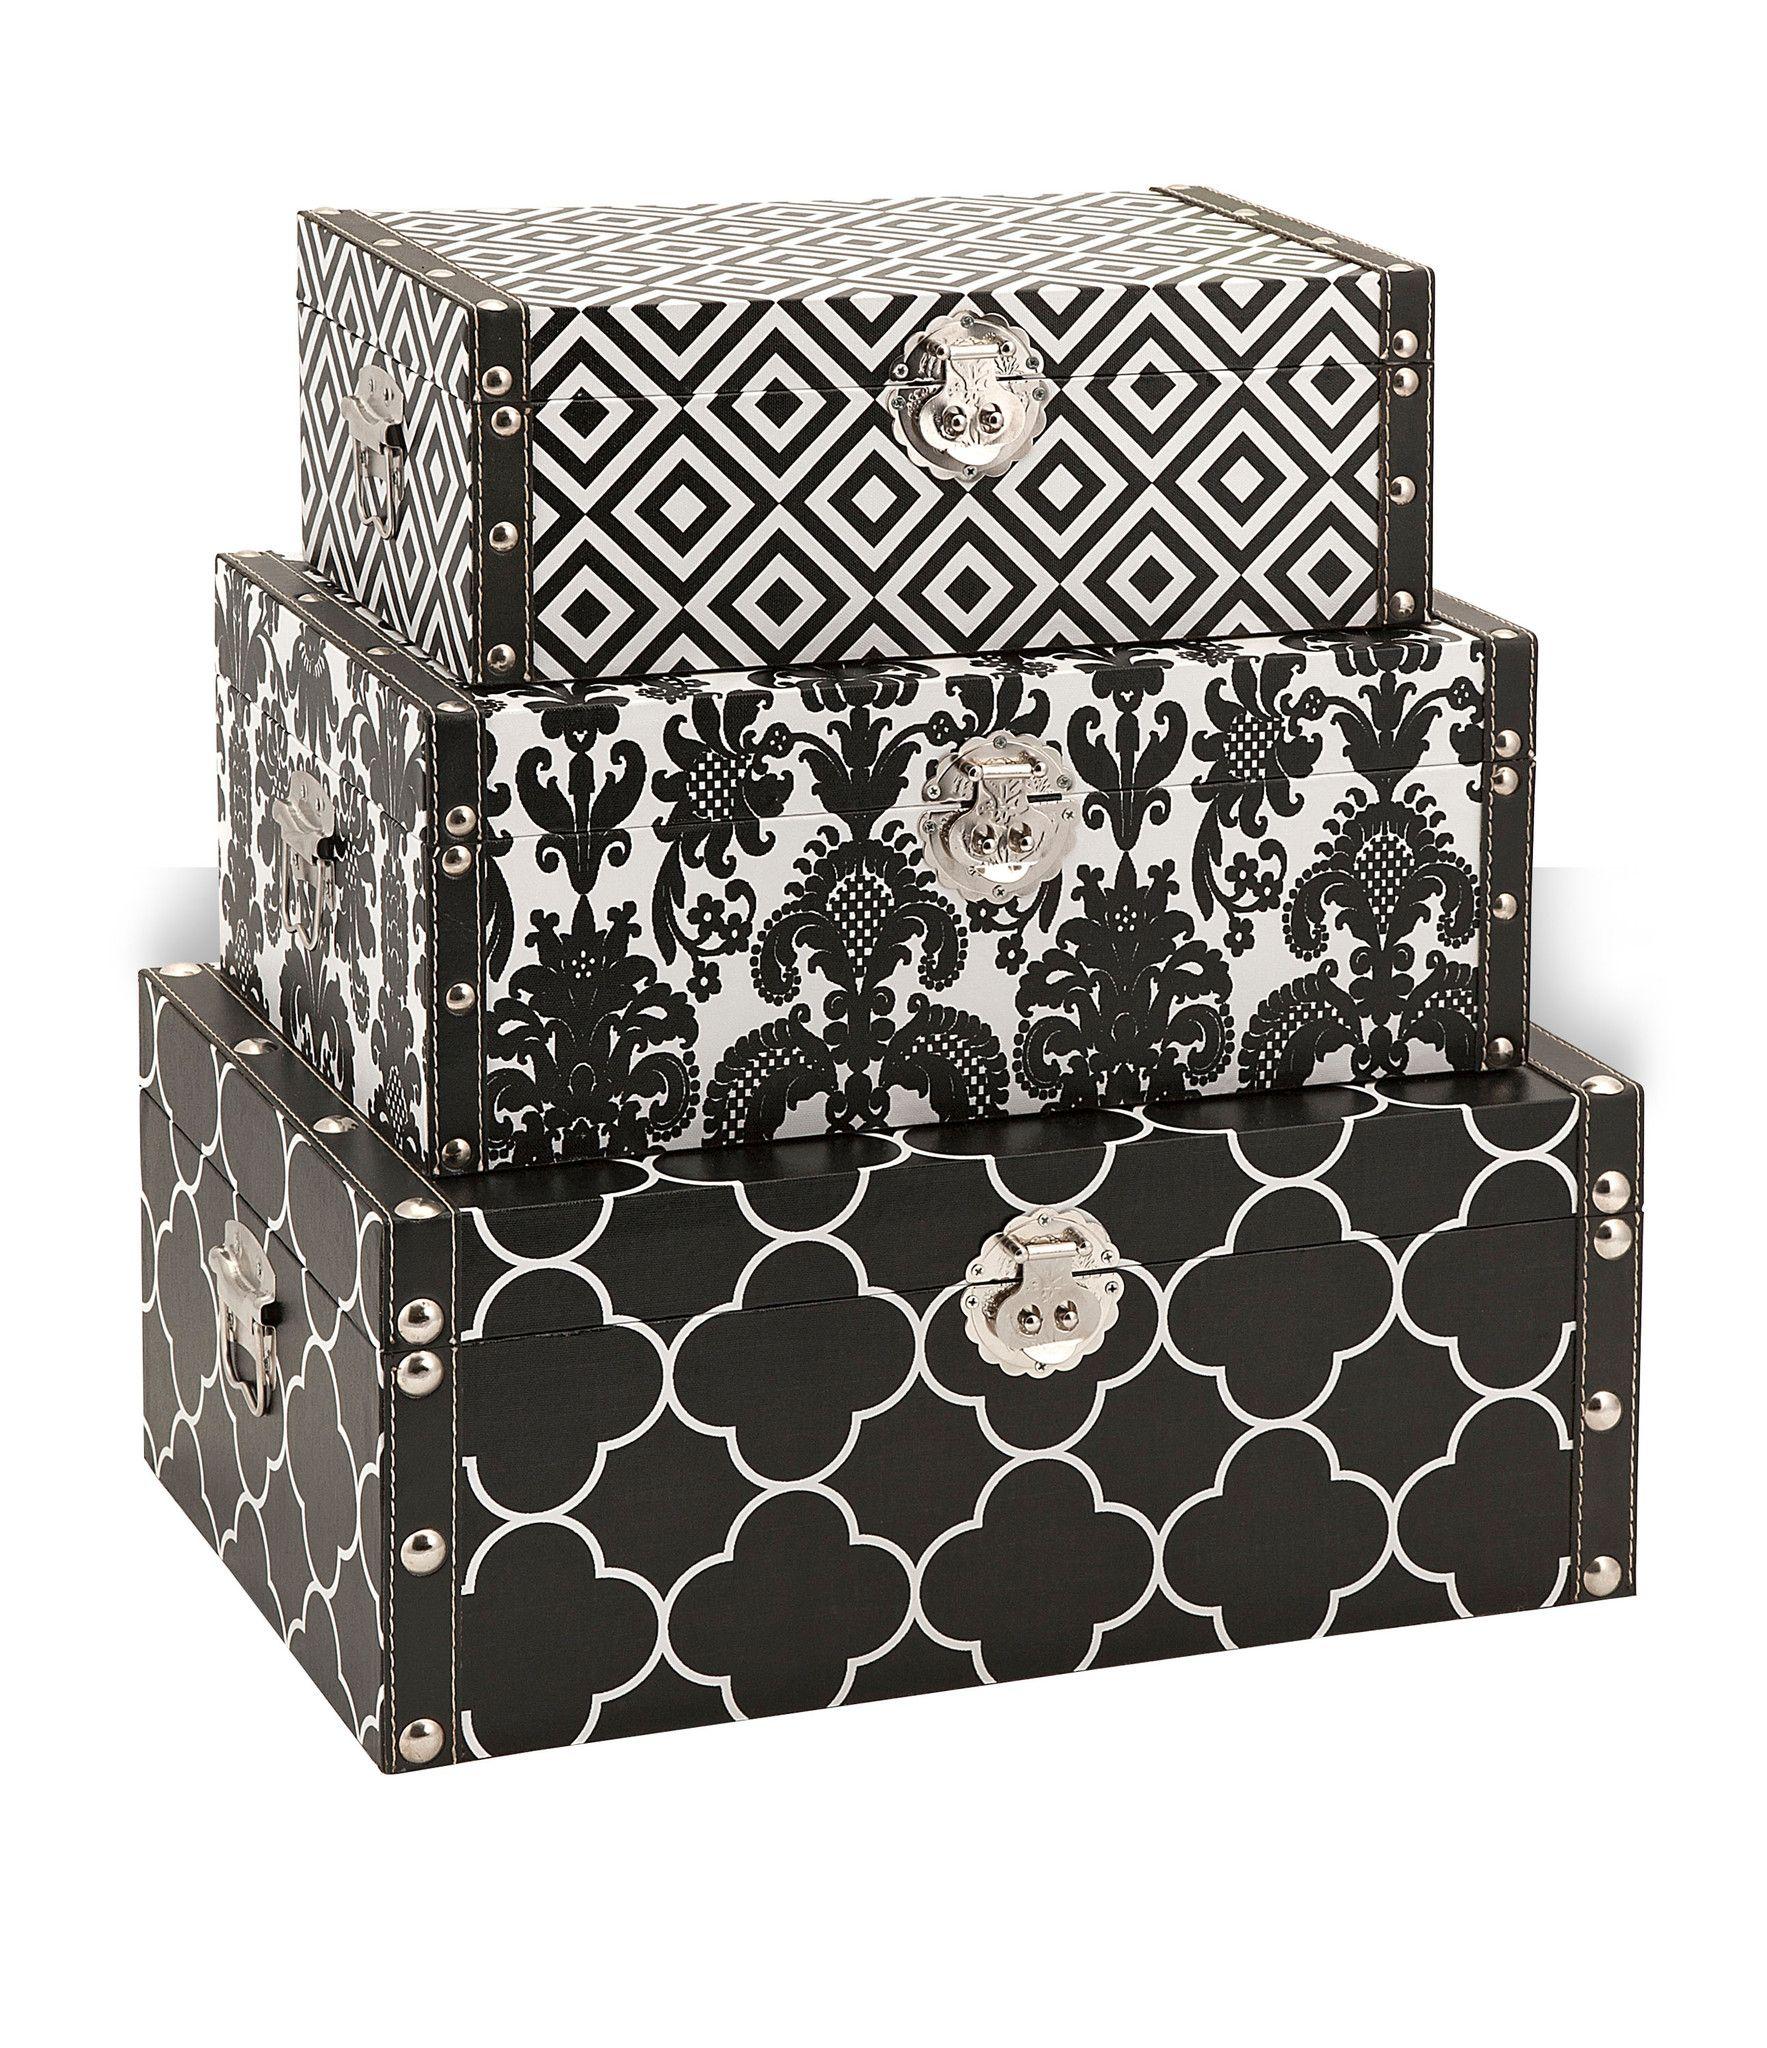 Essentials storage boxes black decorative storage boxes